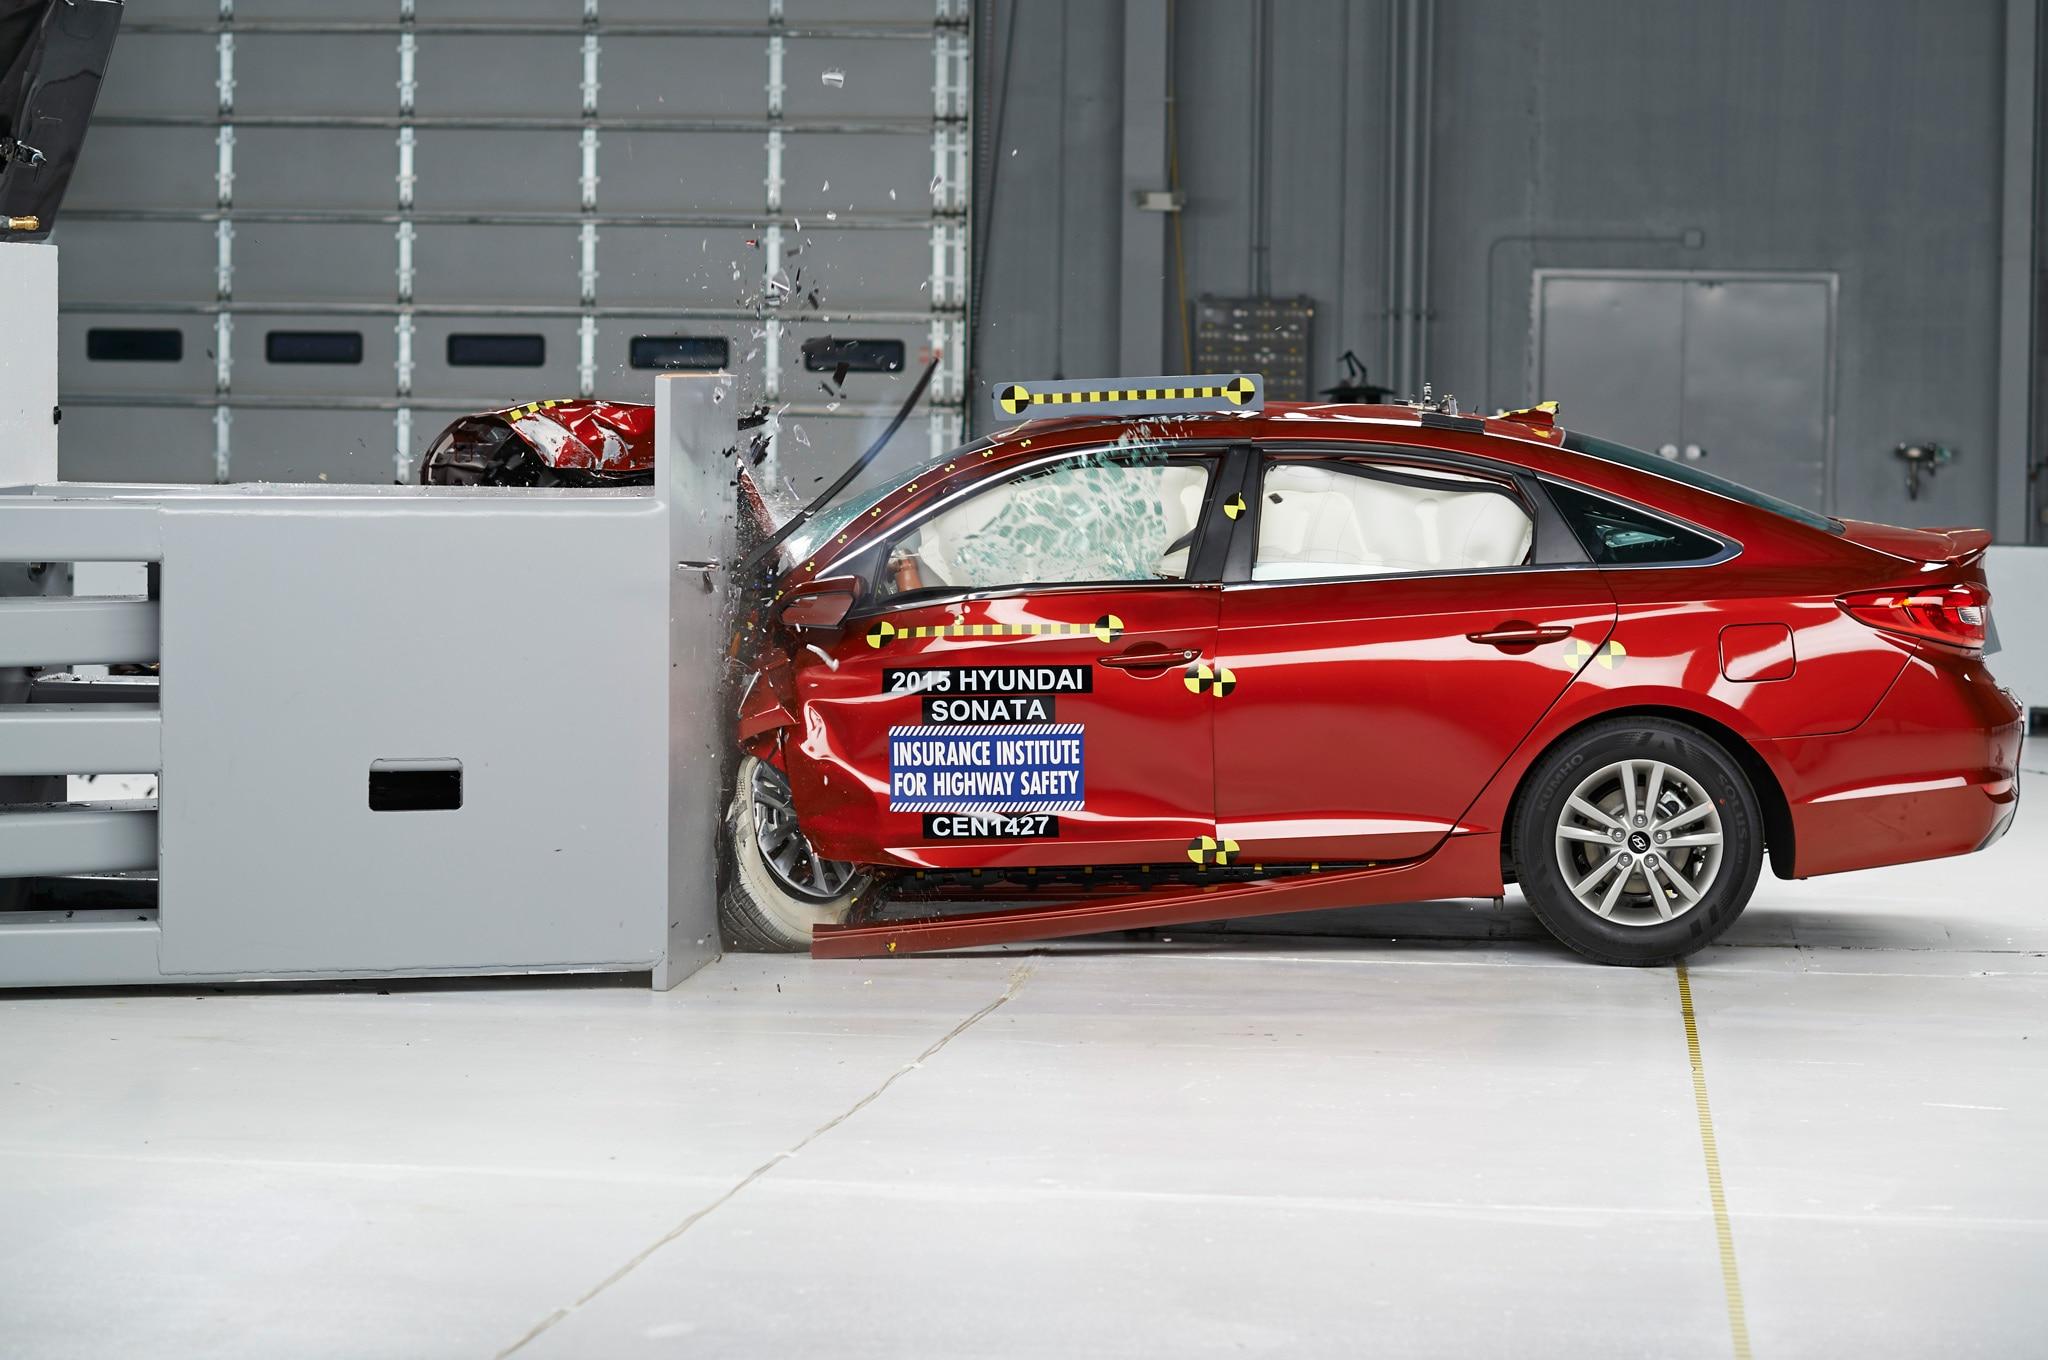 2015 Hyundai Sonata IIHS During Crash1